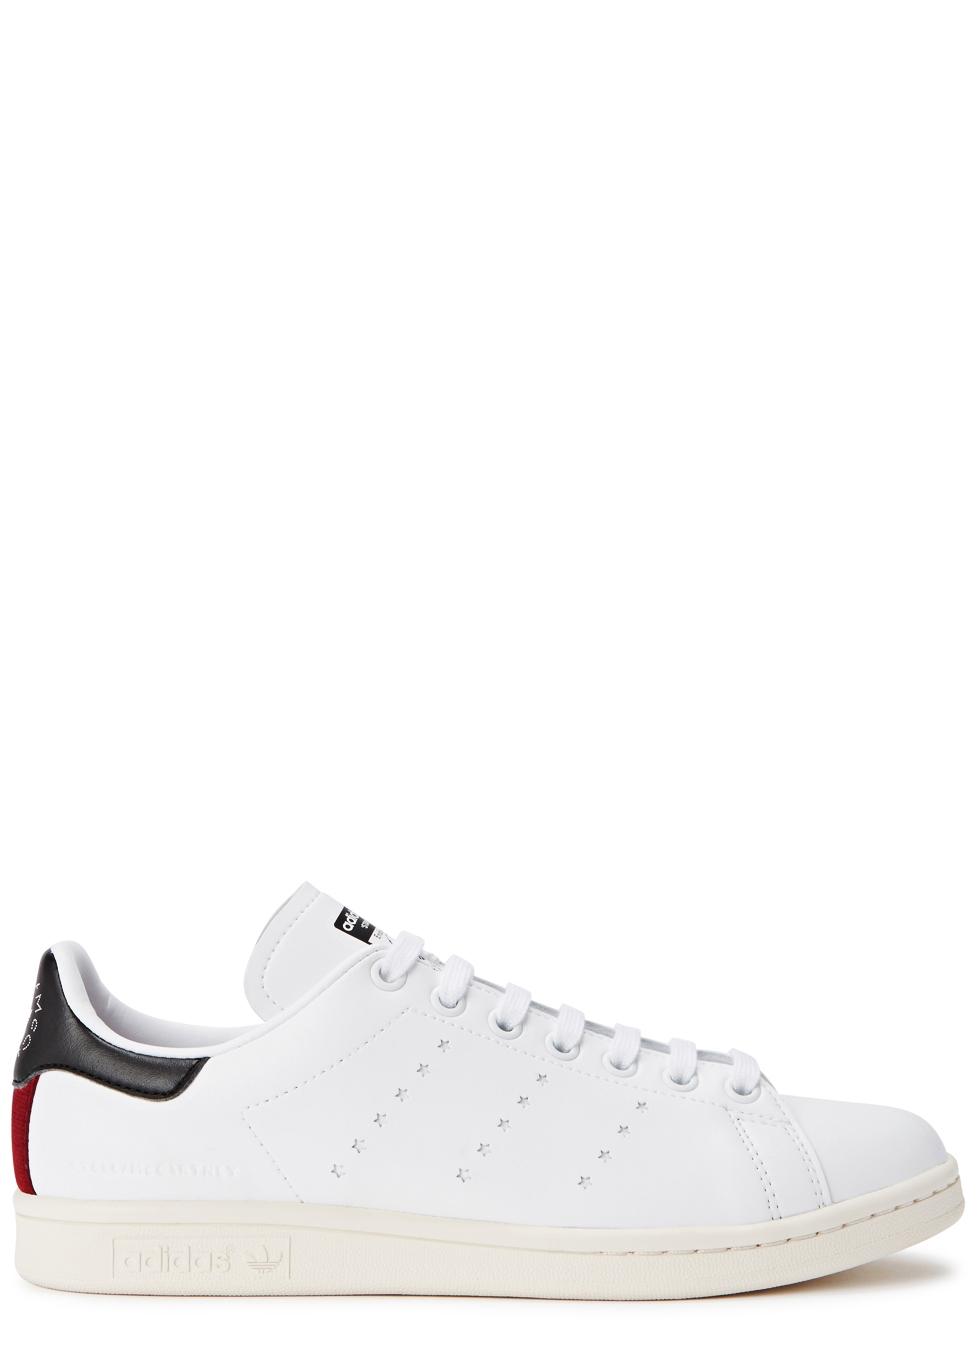 Trainers Stella Mccartney Leather Smith X Adidas Stan Harvey Faux ARqLj543